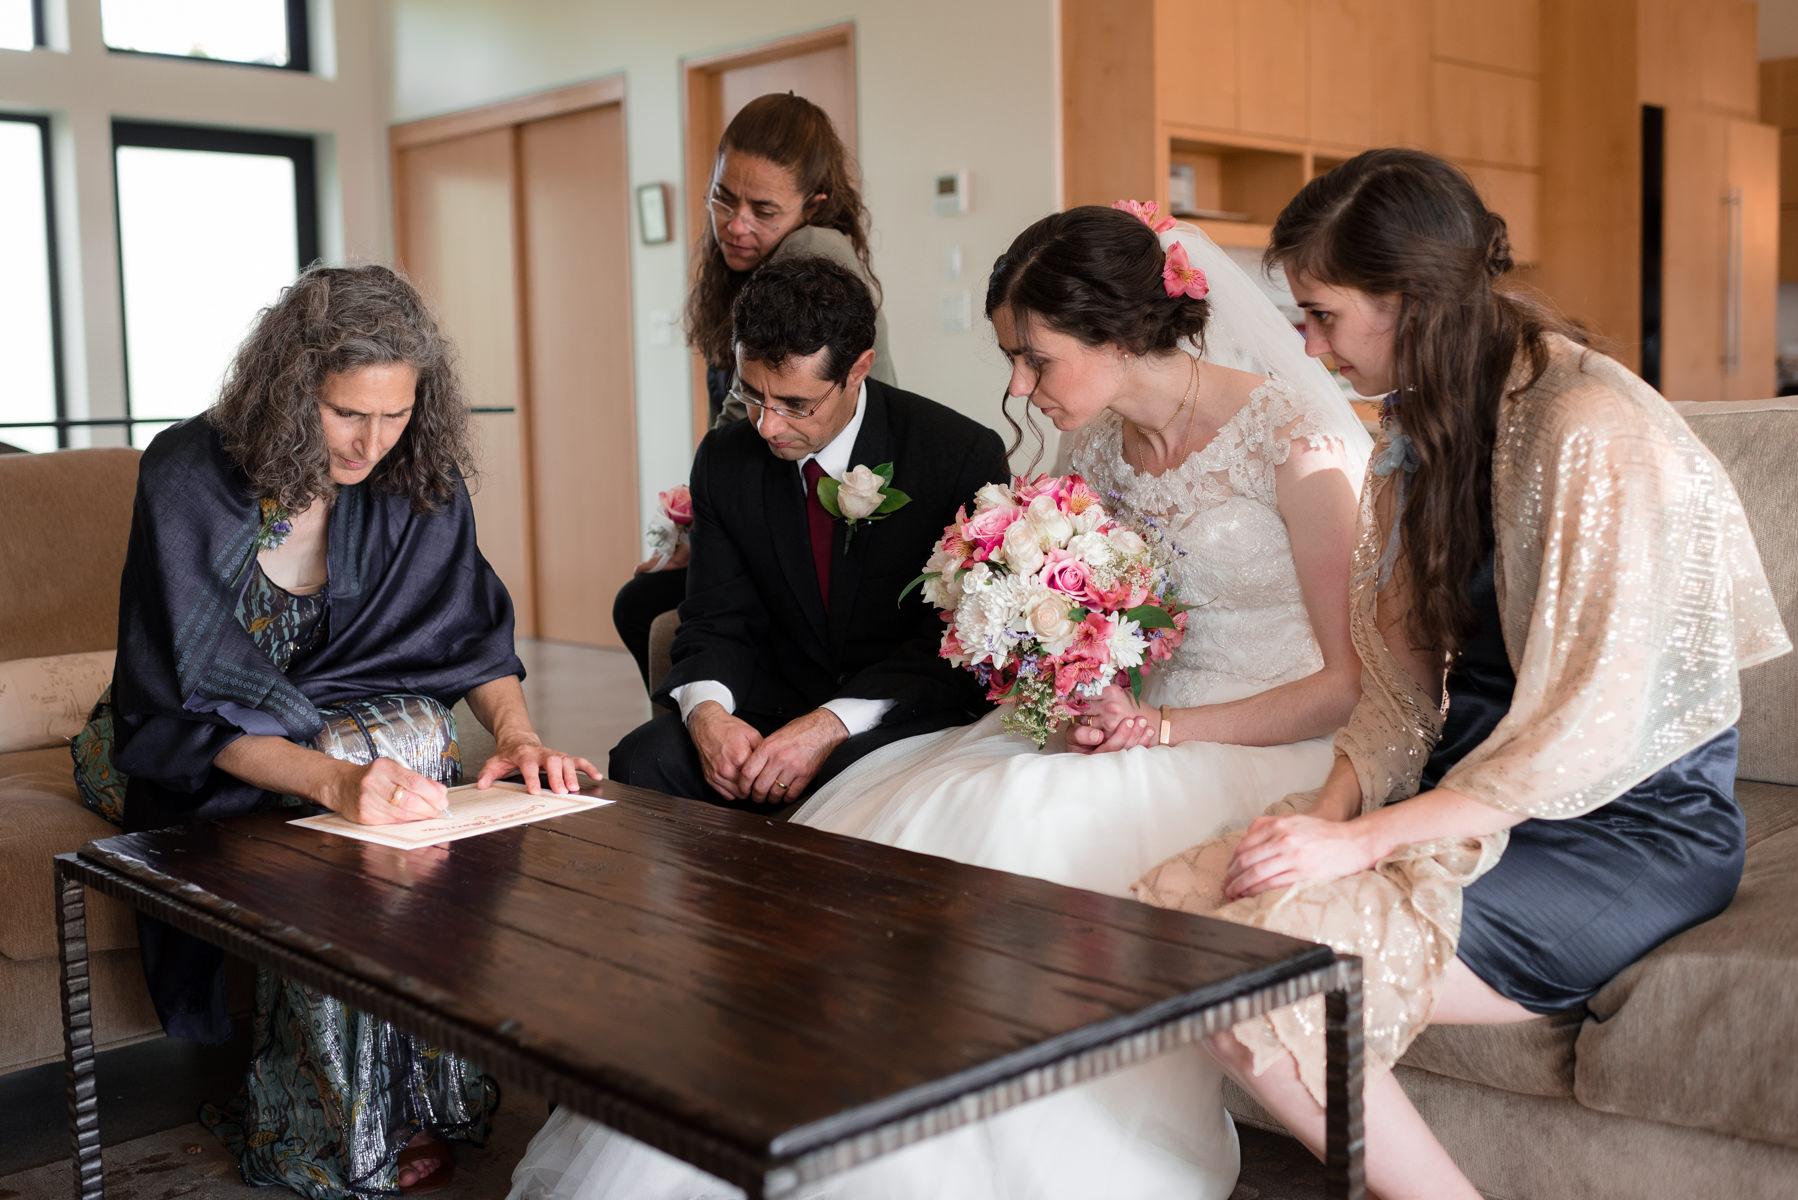 Andrew Tat - Documentary Wedding Photography - Kirkland, Washington - Emily & Cuauh - 28.JPG